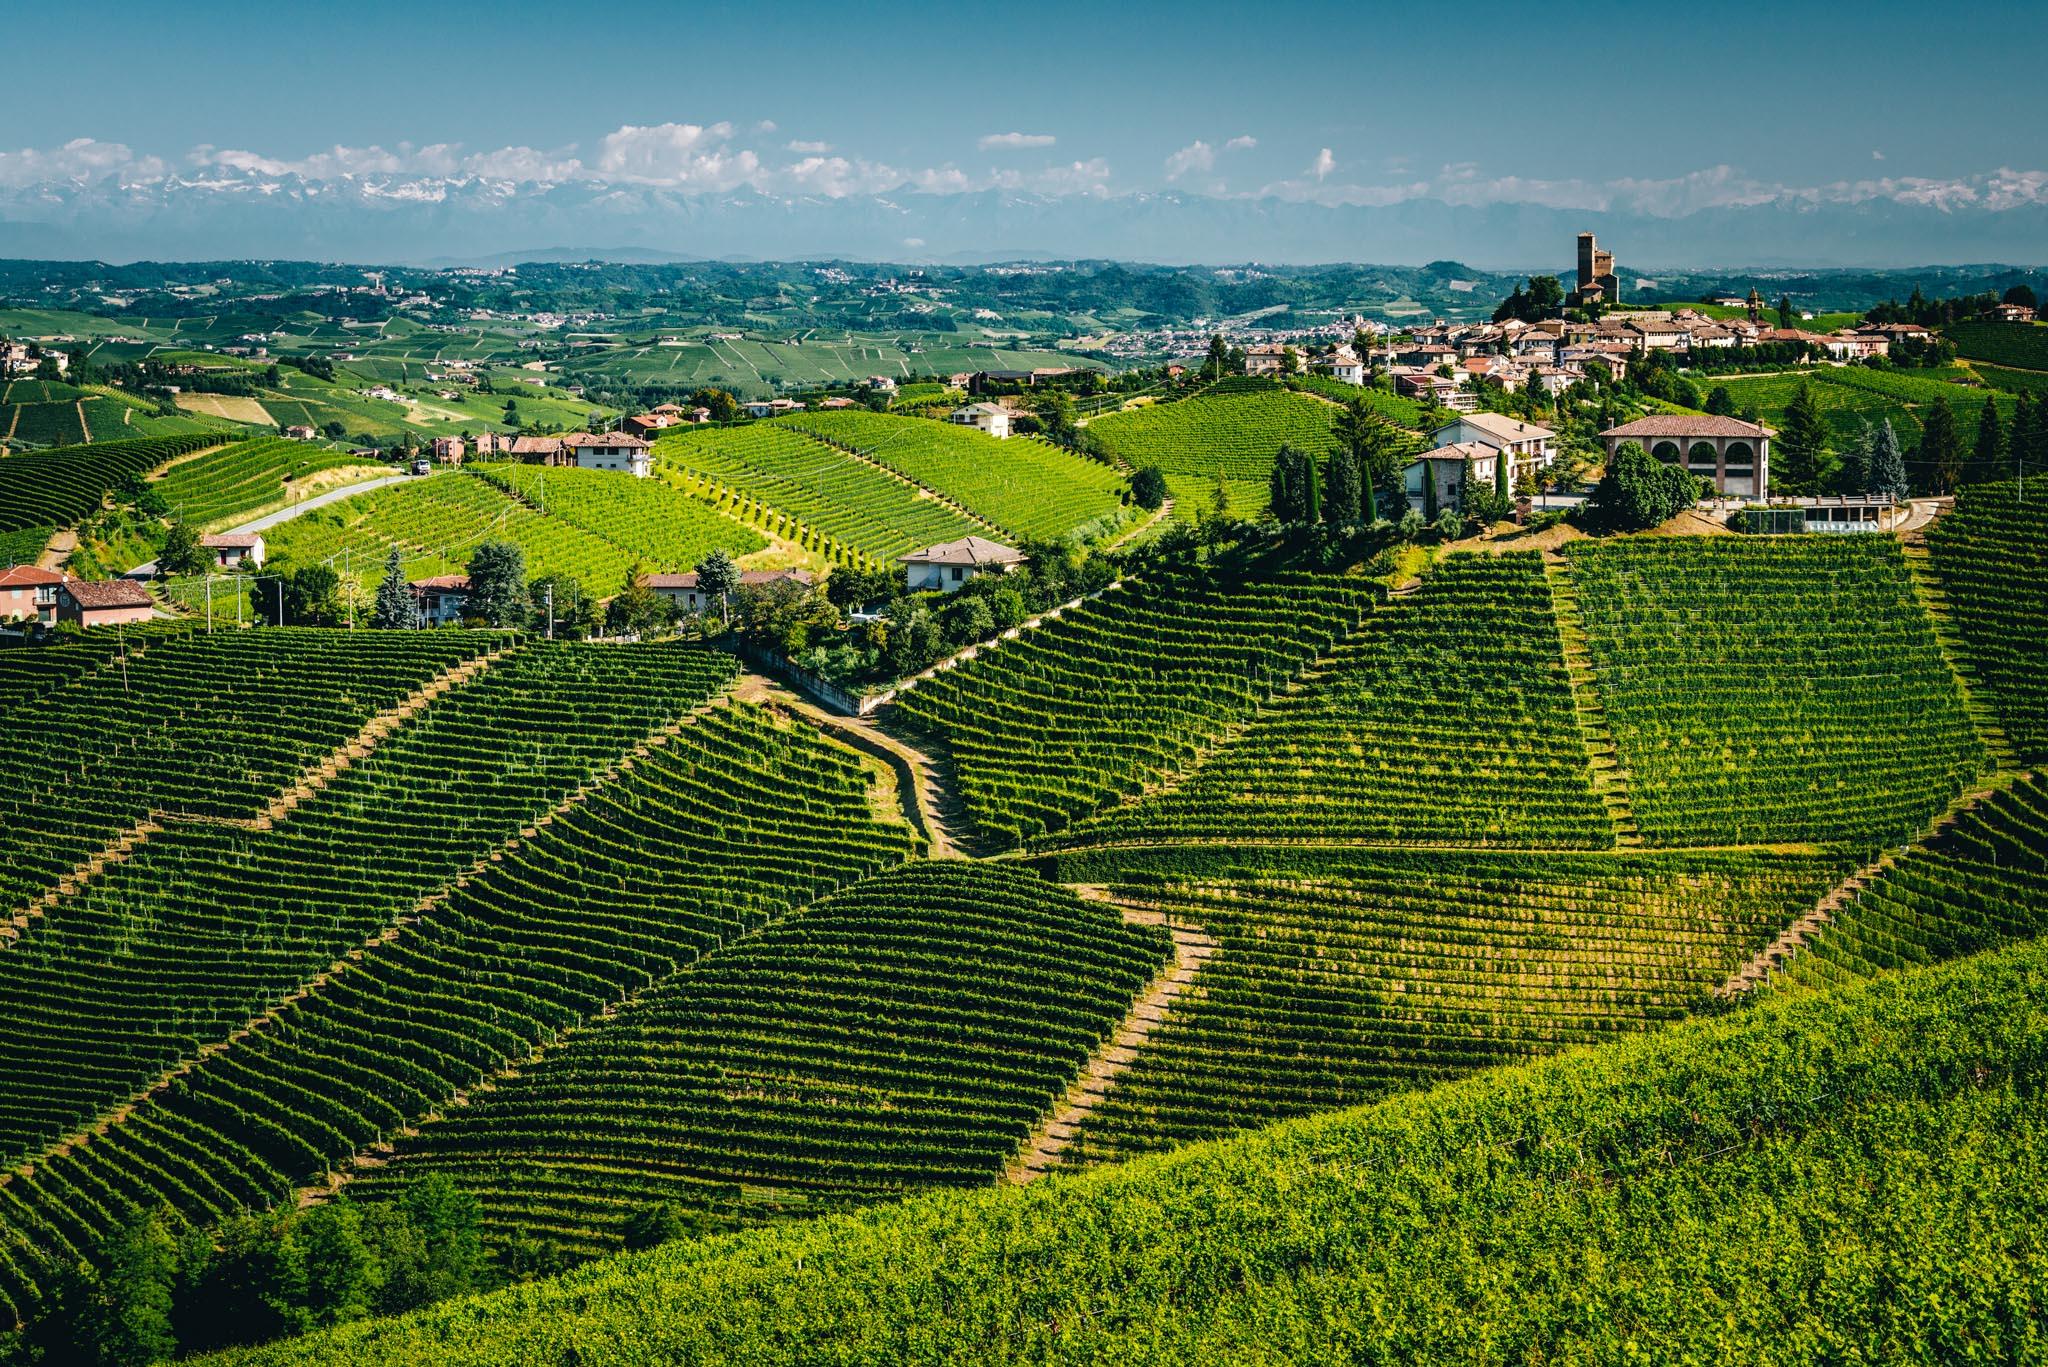 Italy : Piedmont : Bruno Giacosa's estate, Falletto vineyard, and Serralunga d'Alba in the distance